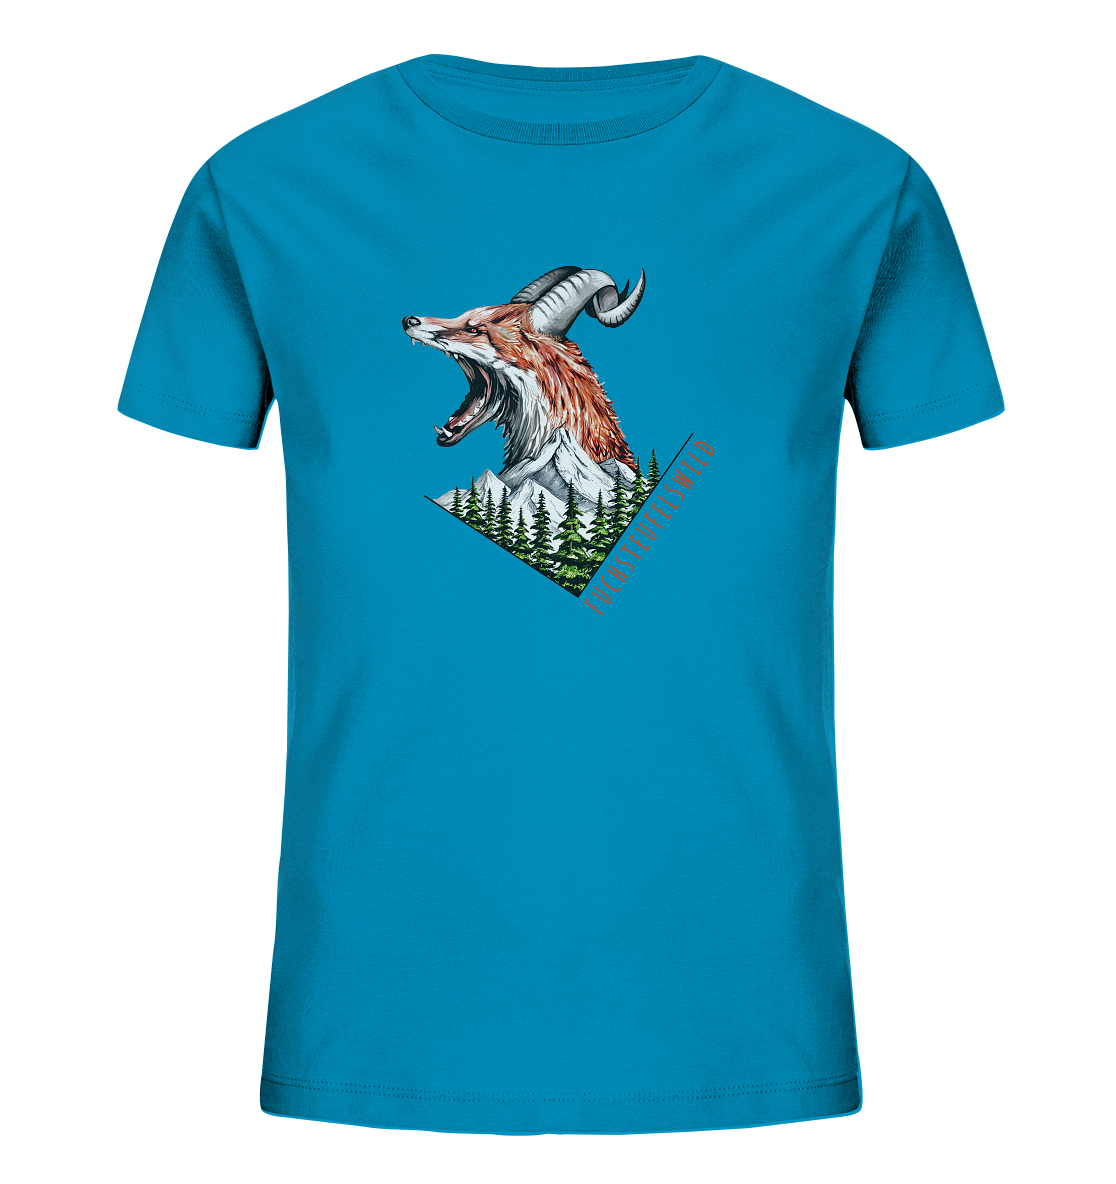 front-kids-organic-shirt-0092c0-1116x-1.png